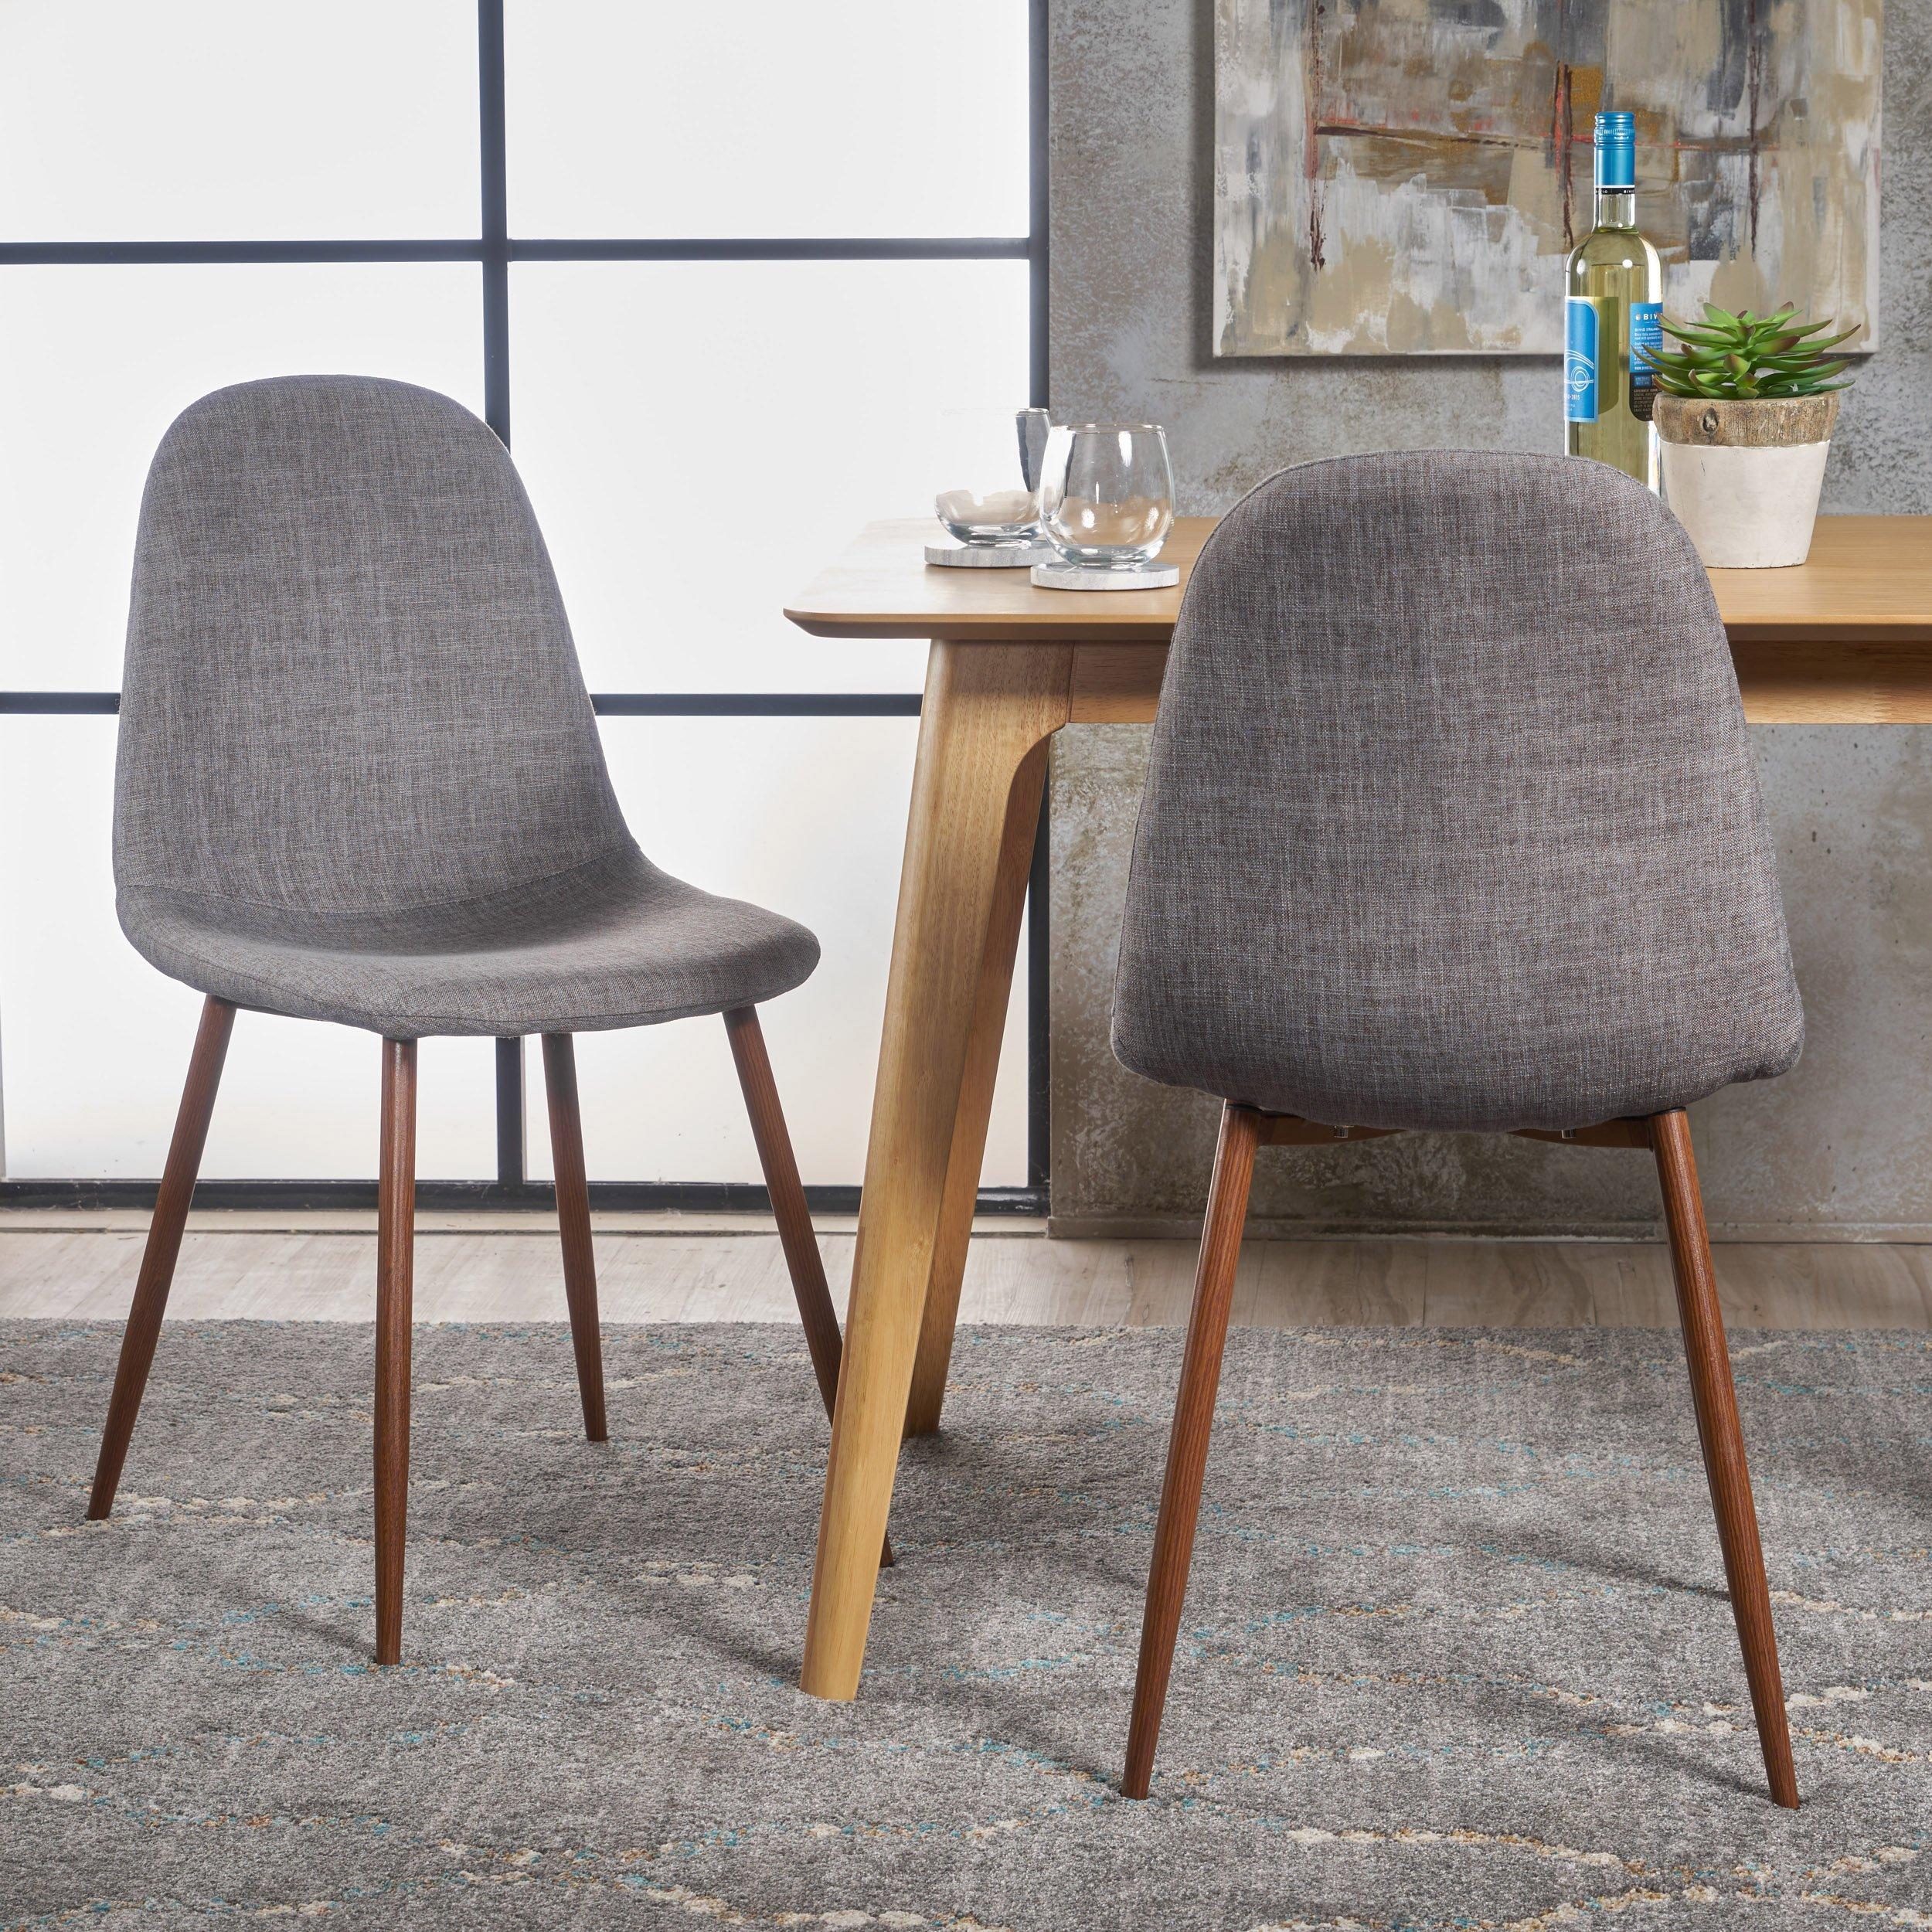 Christopher Knight Home 301730 Raina Dining Chairs, Light Grey + Dark Brown